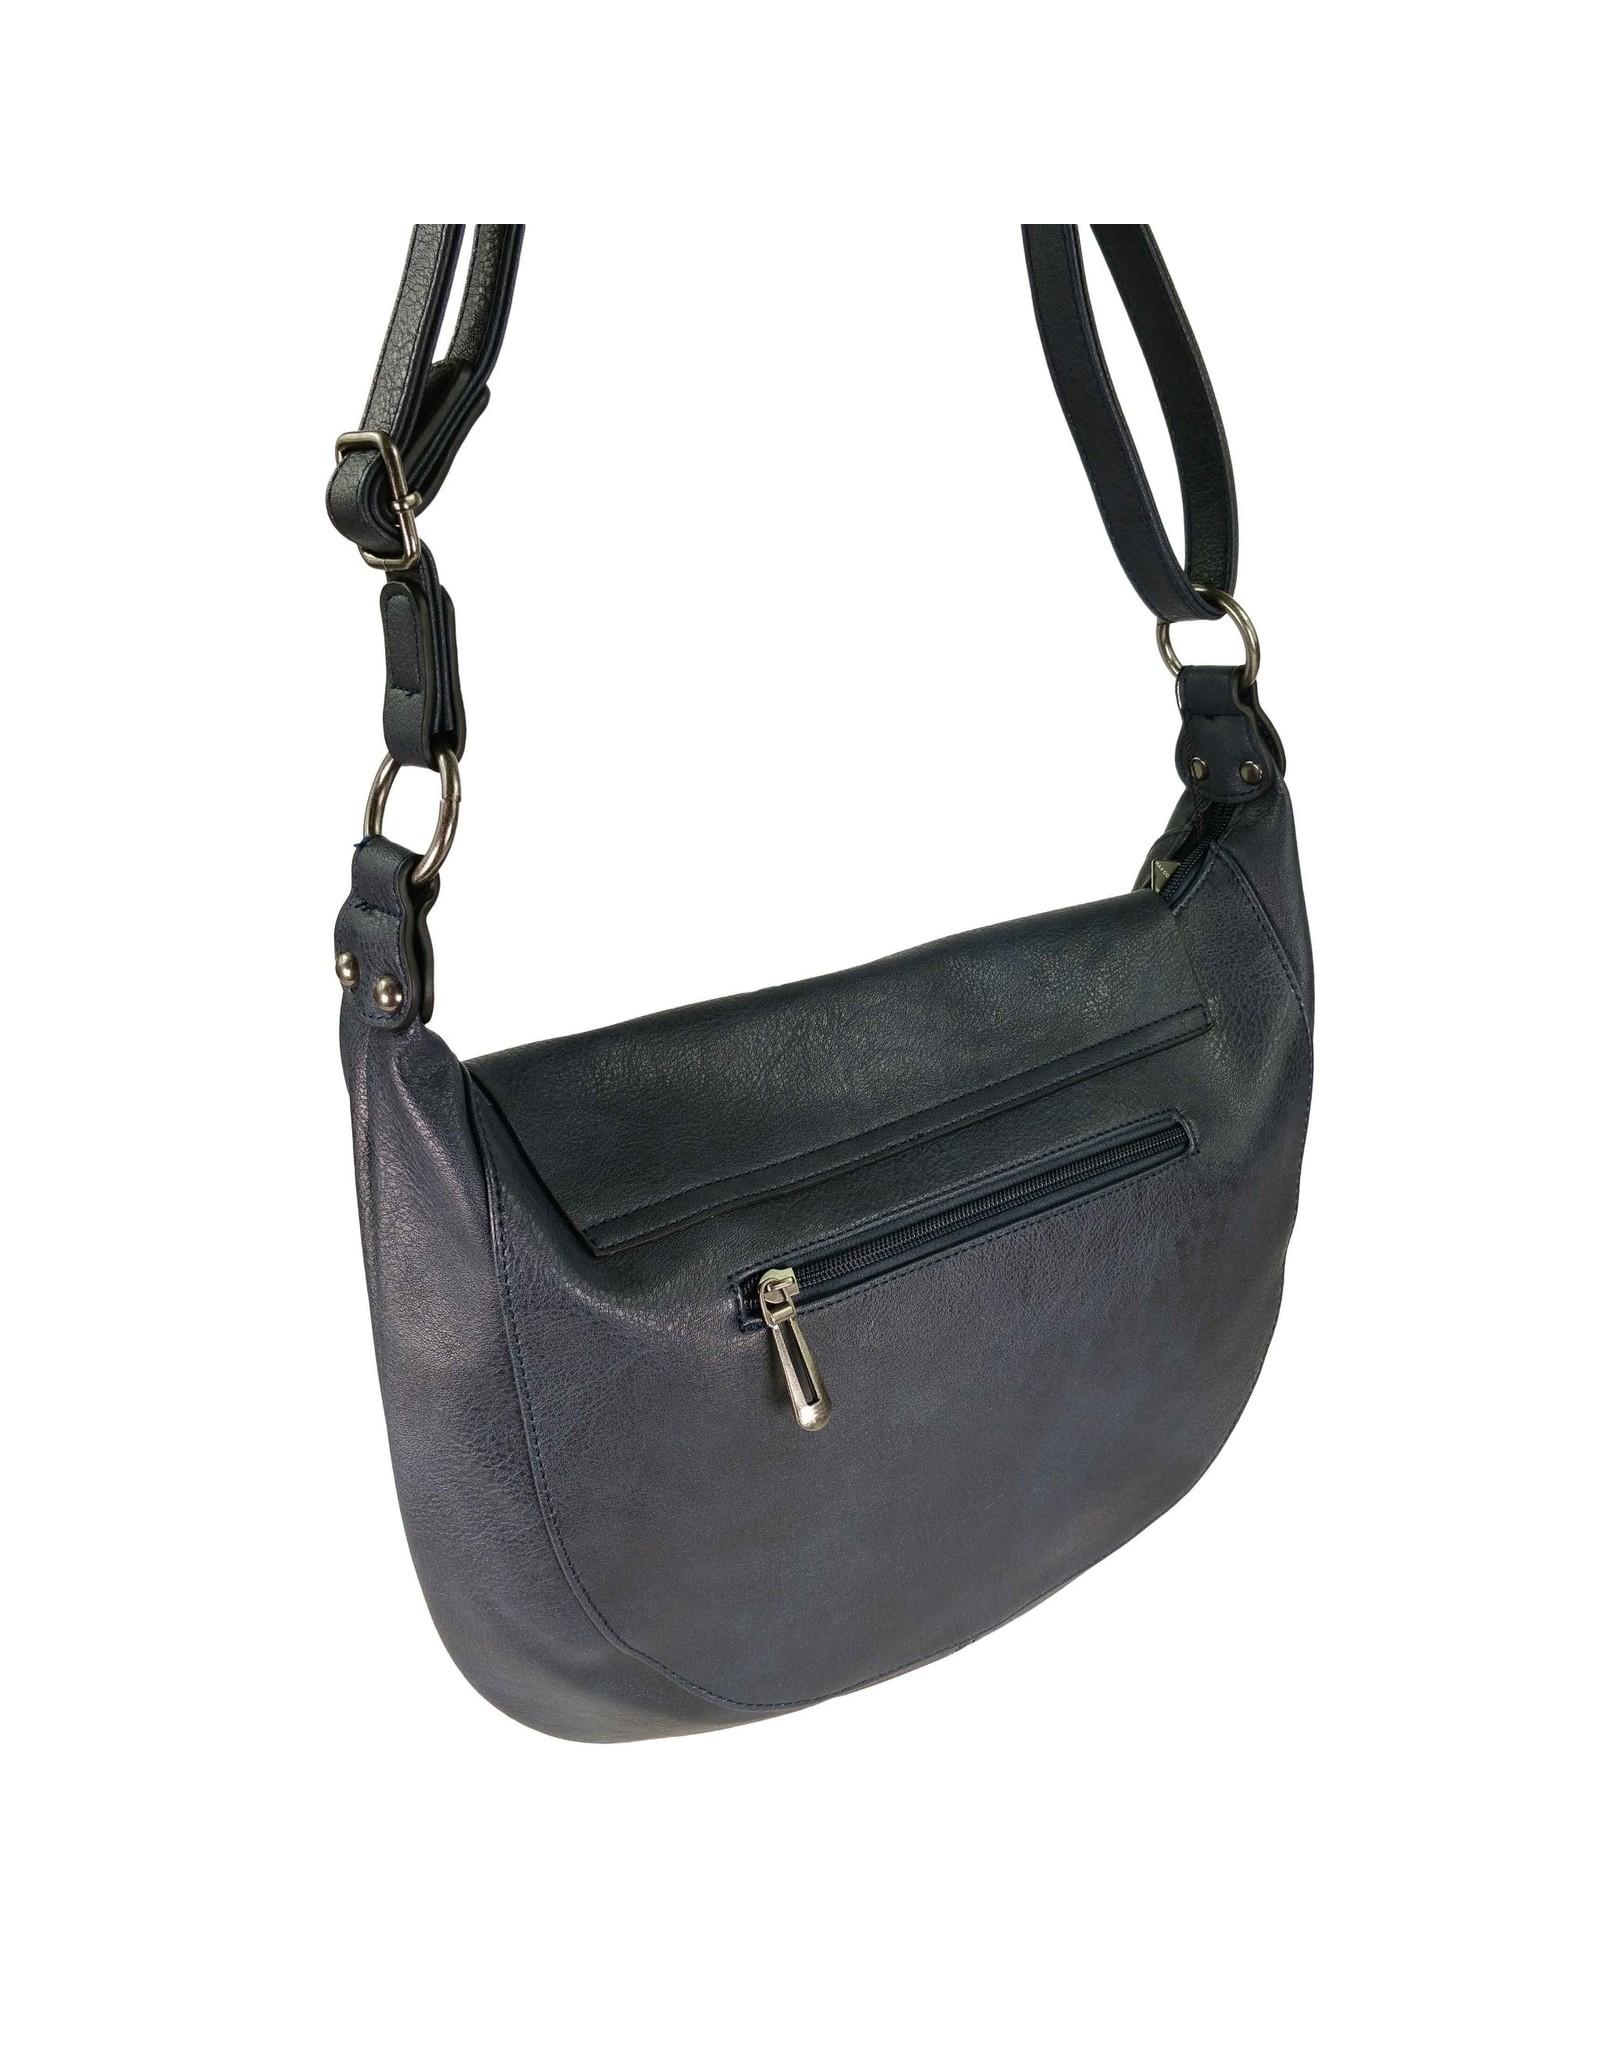 Handtas afgerond donkerblauw